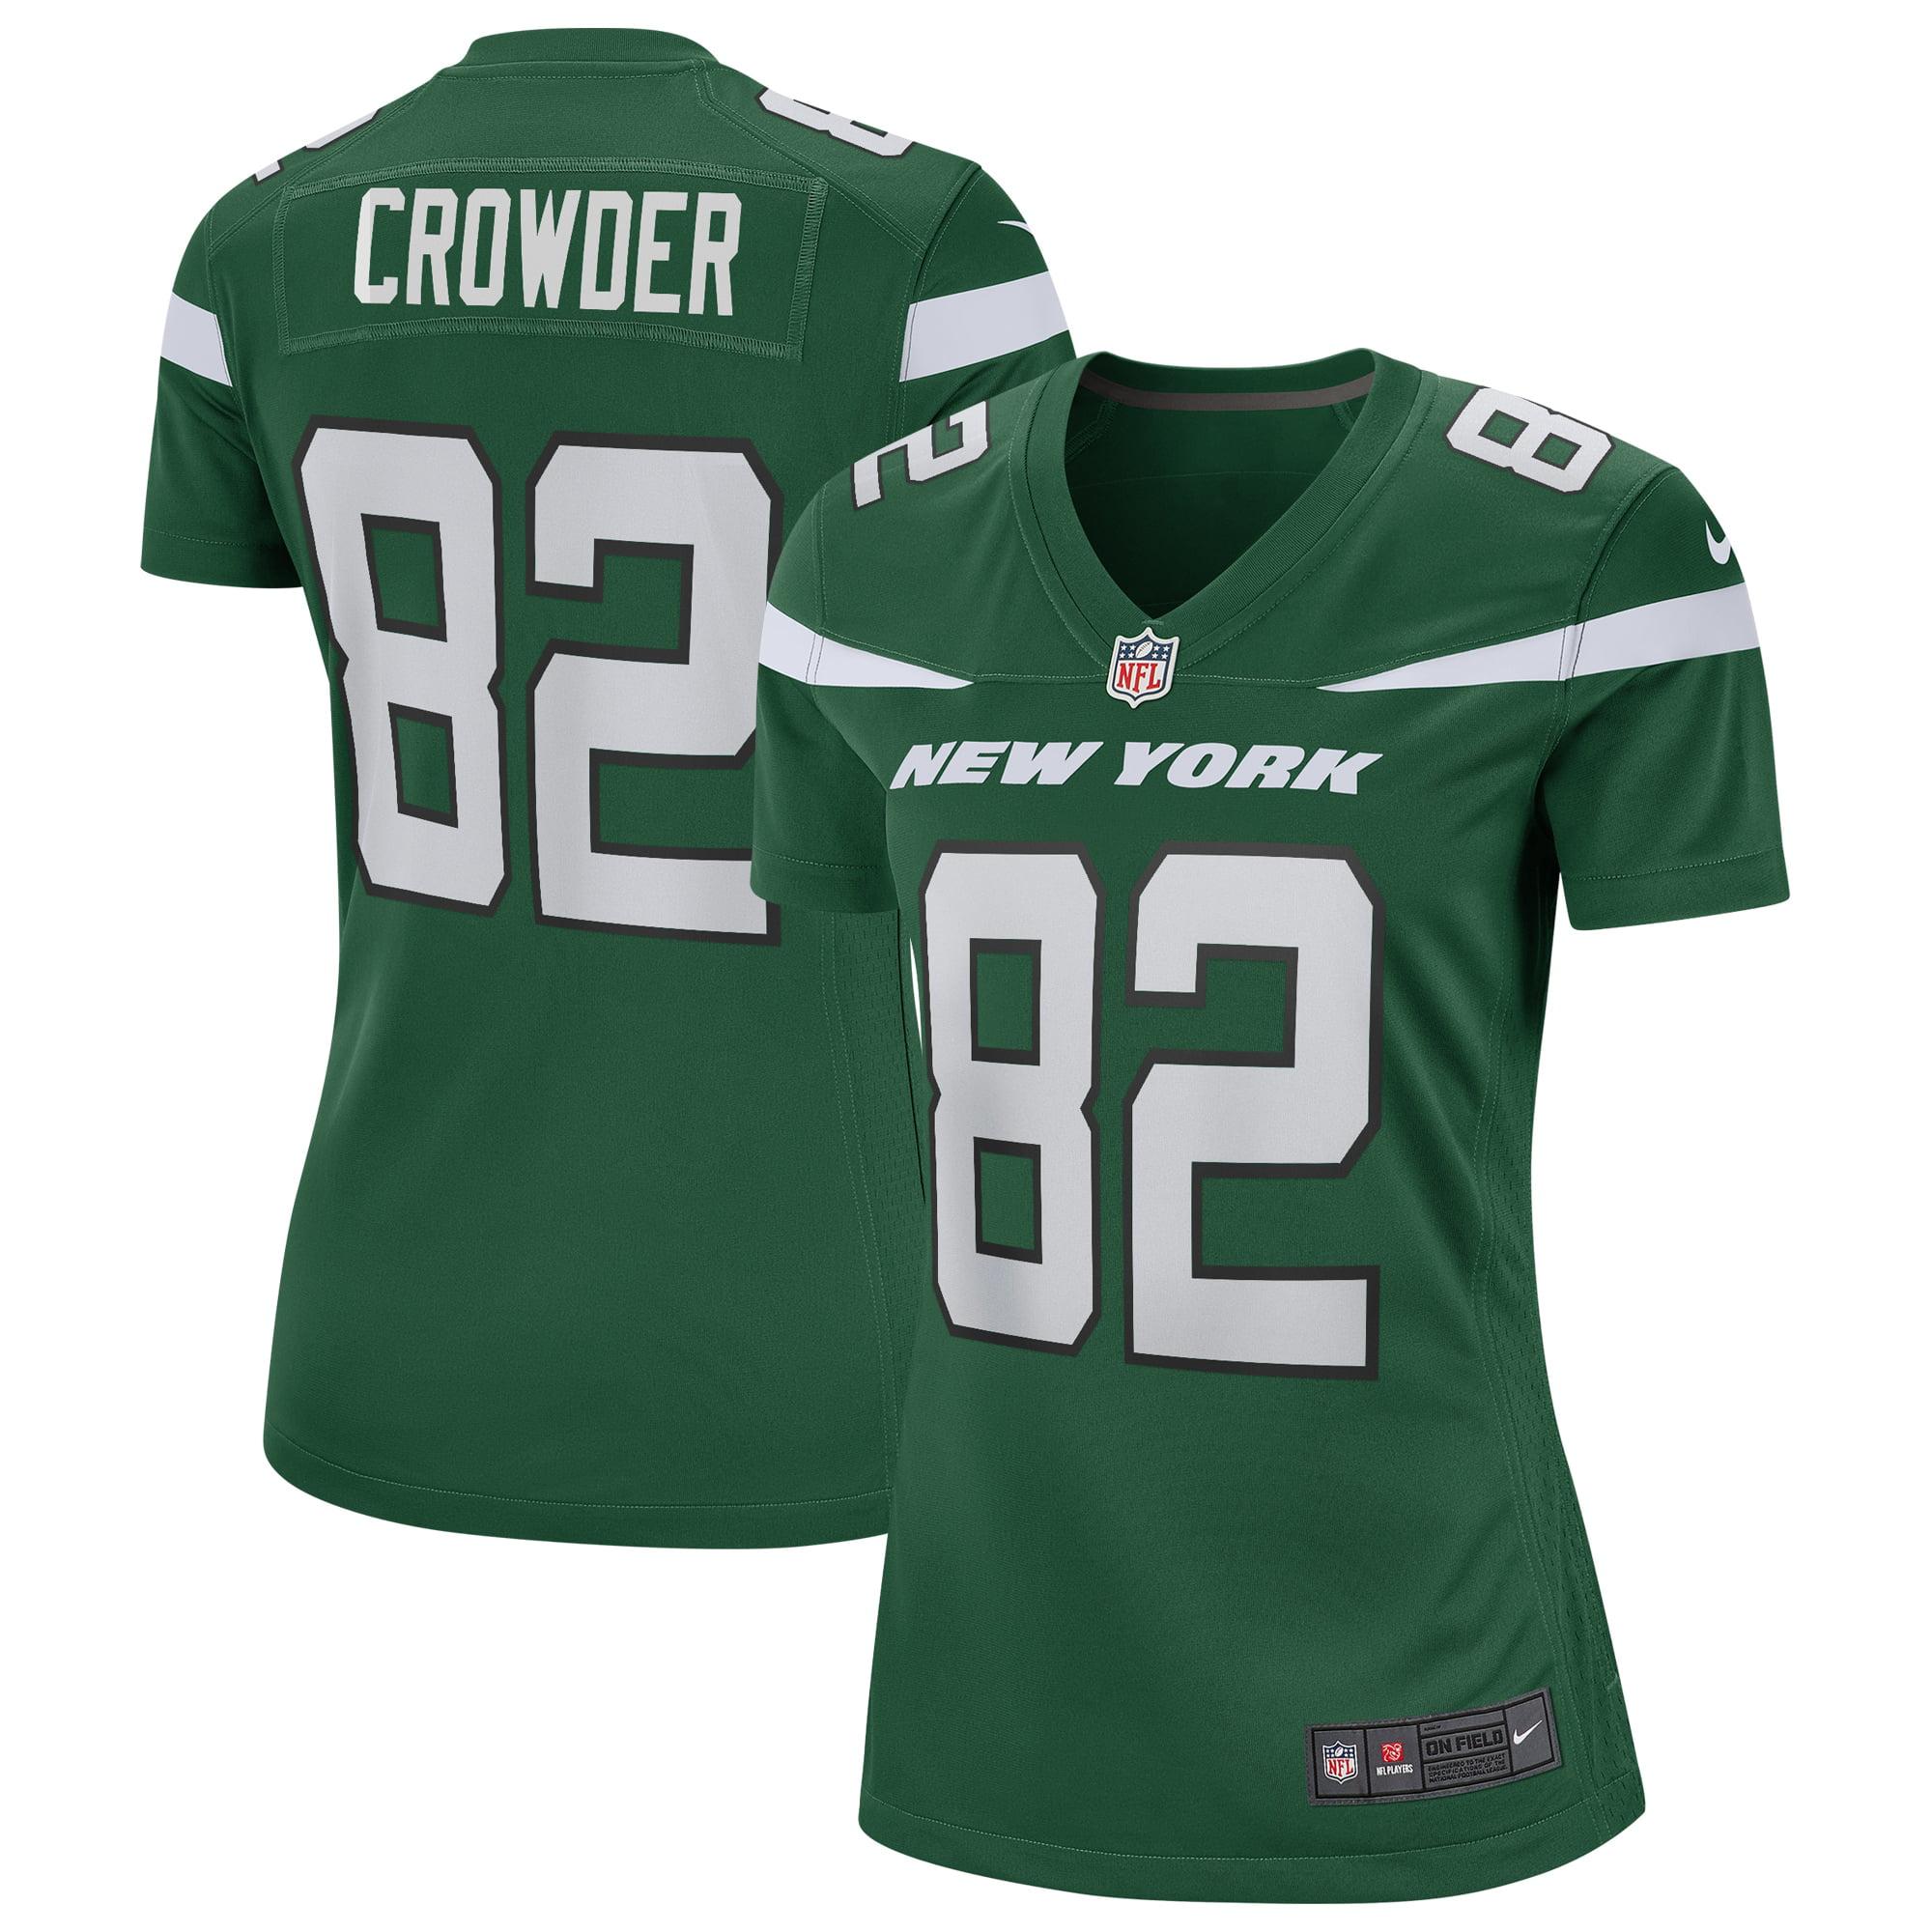 Jamison Crowder New York Jets Nike Women's Game Jersey - Gotham Green - Walmart.com